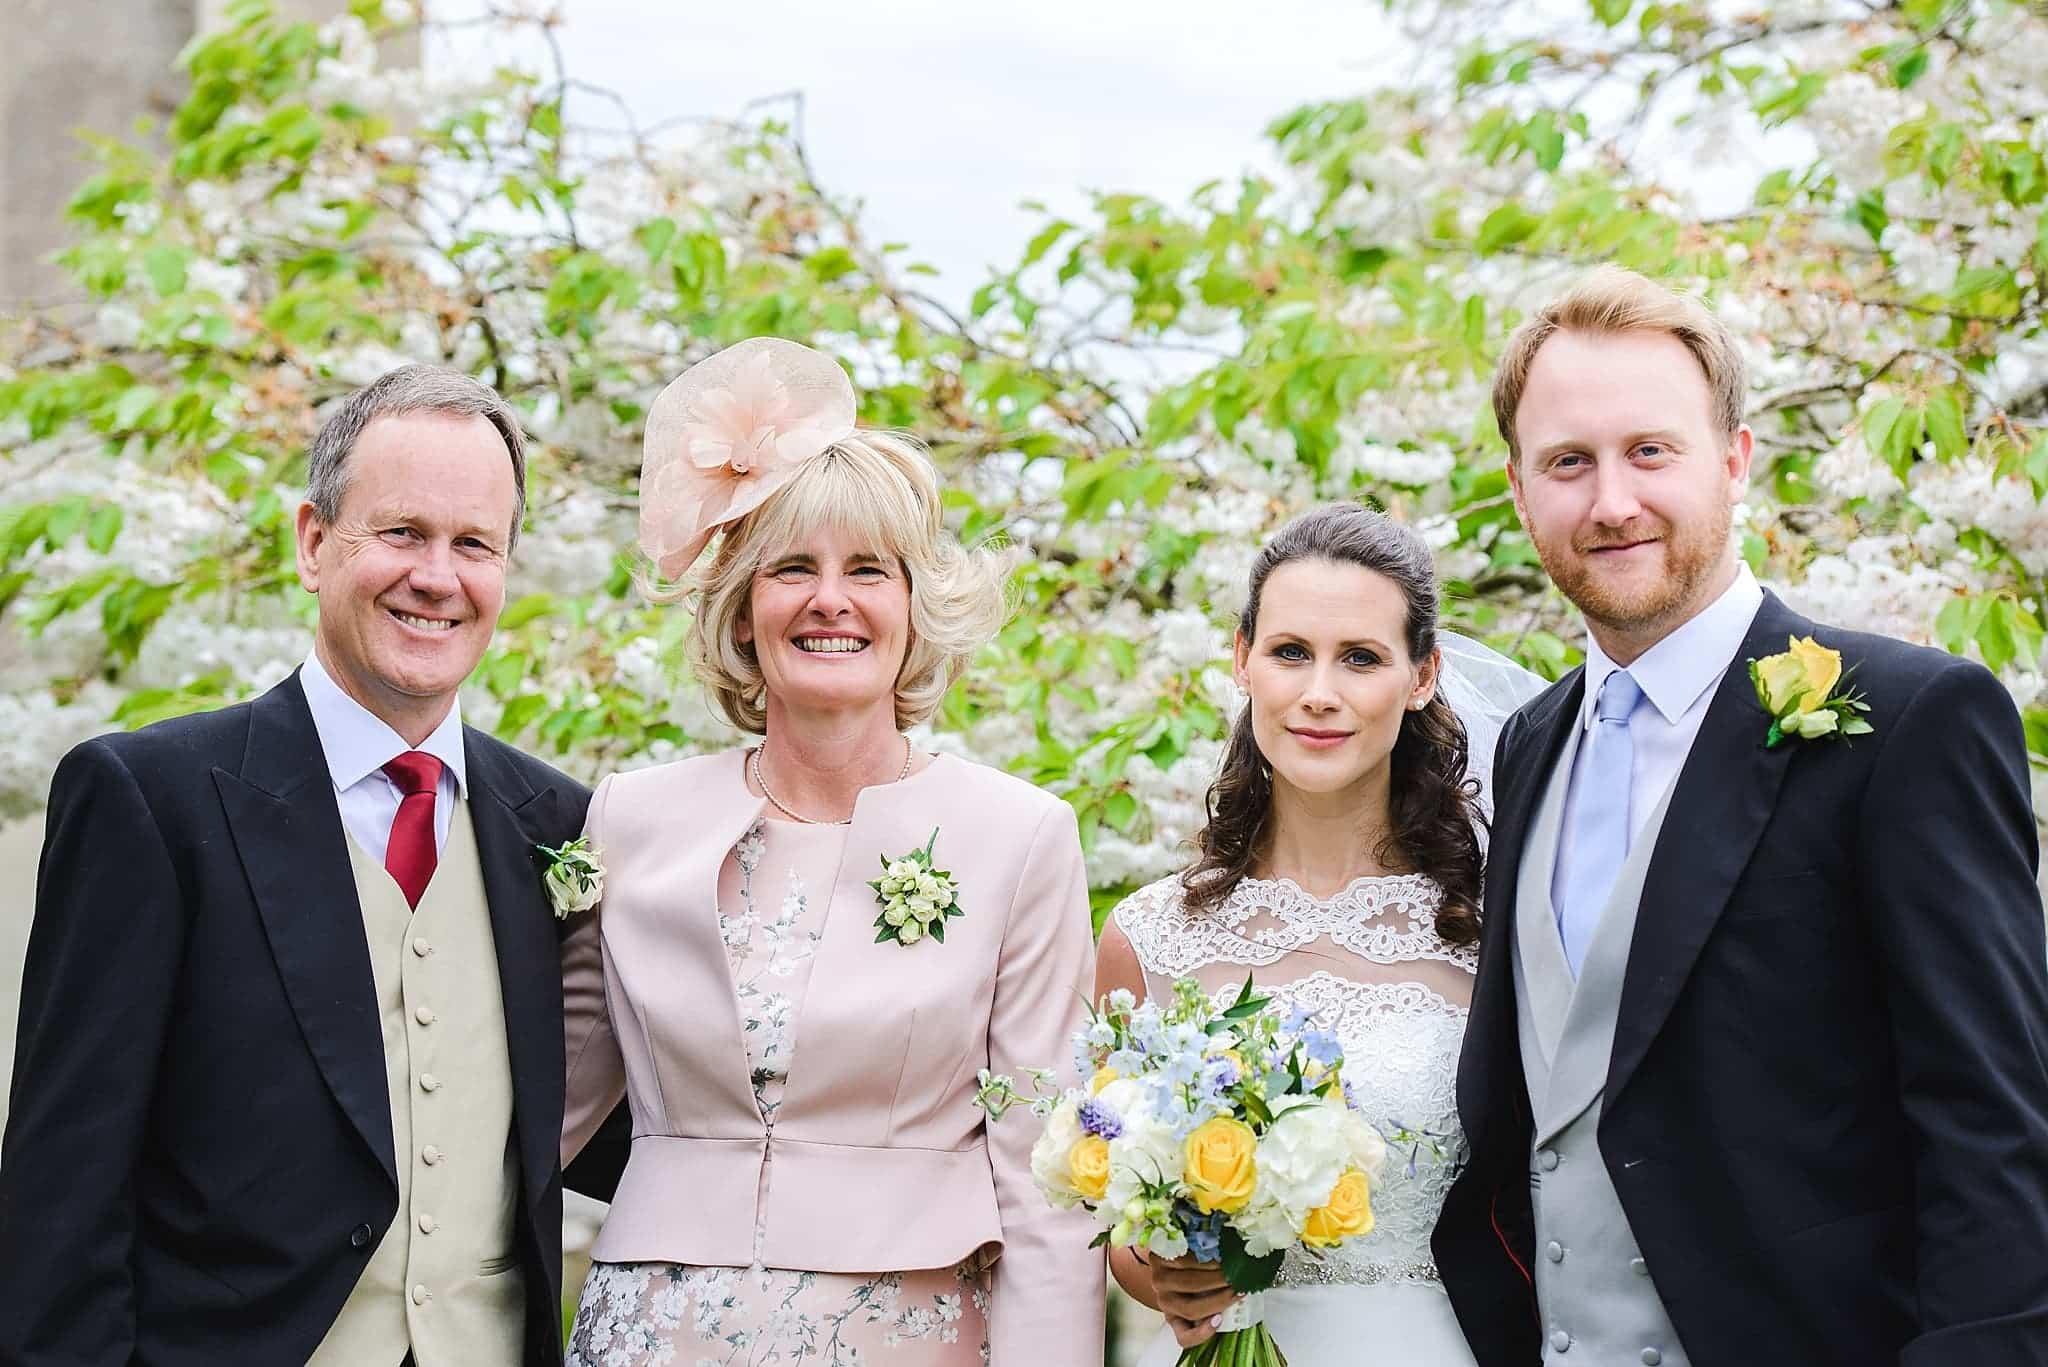 Family formals outside St Swithins church, Bathford